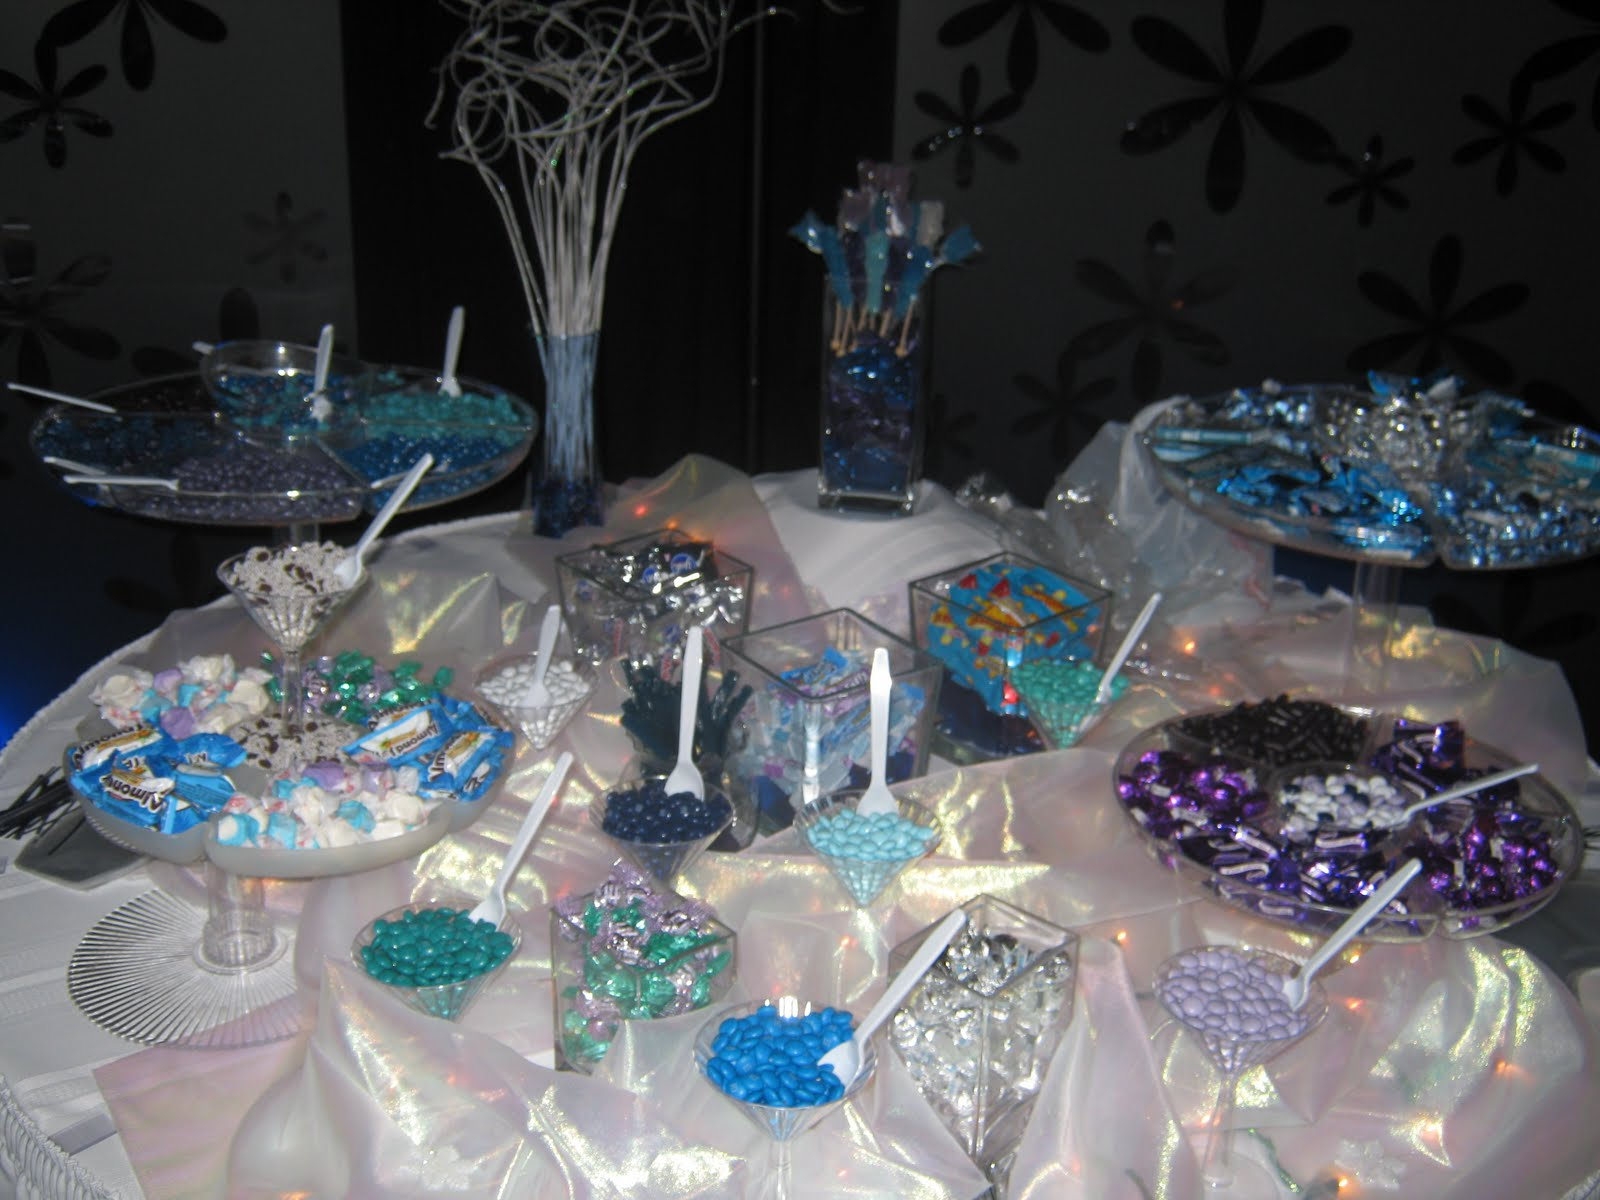 Sweet Ts Cake Design 16 Winter Wonderland Ice Palace Theme Birthday Party